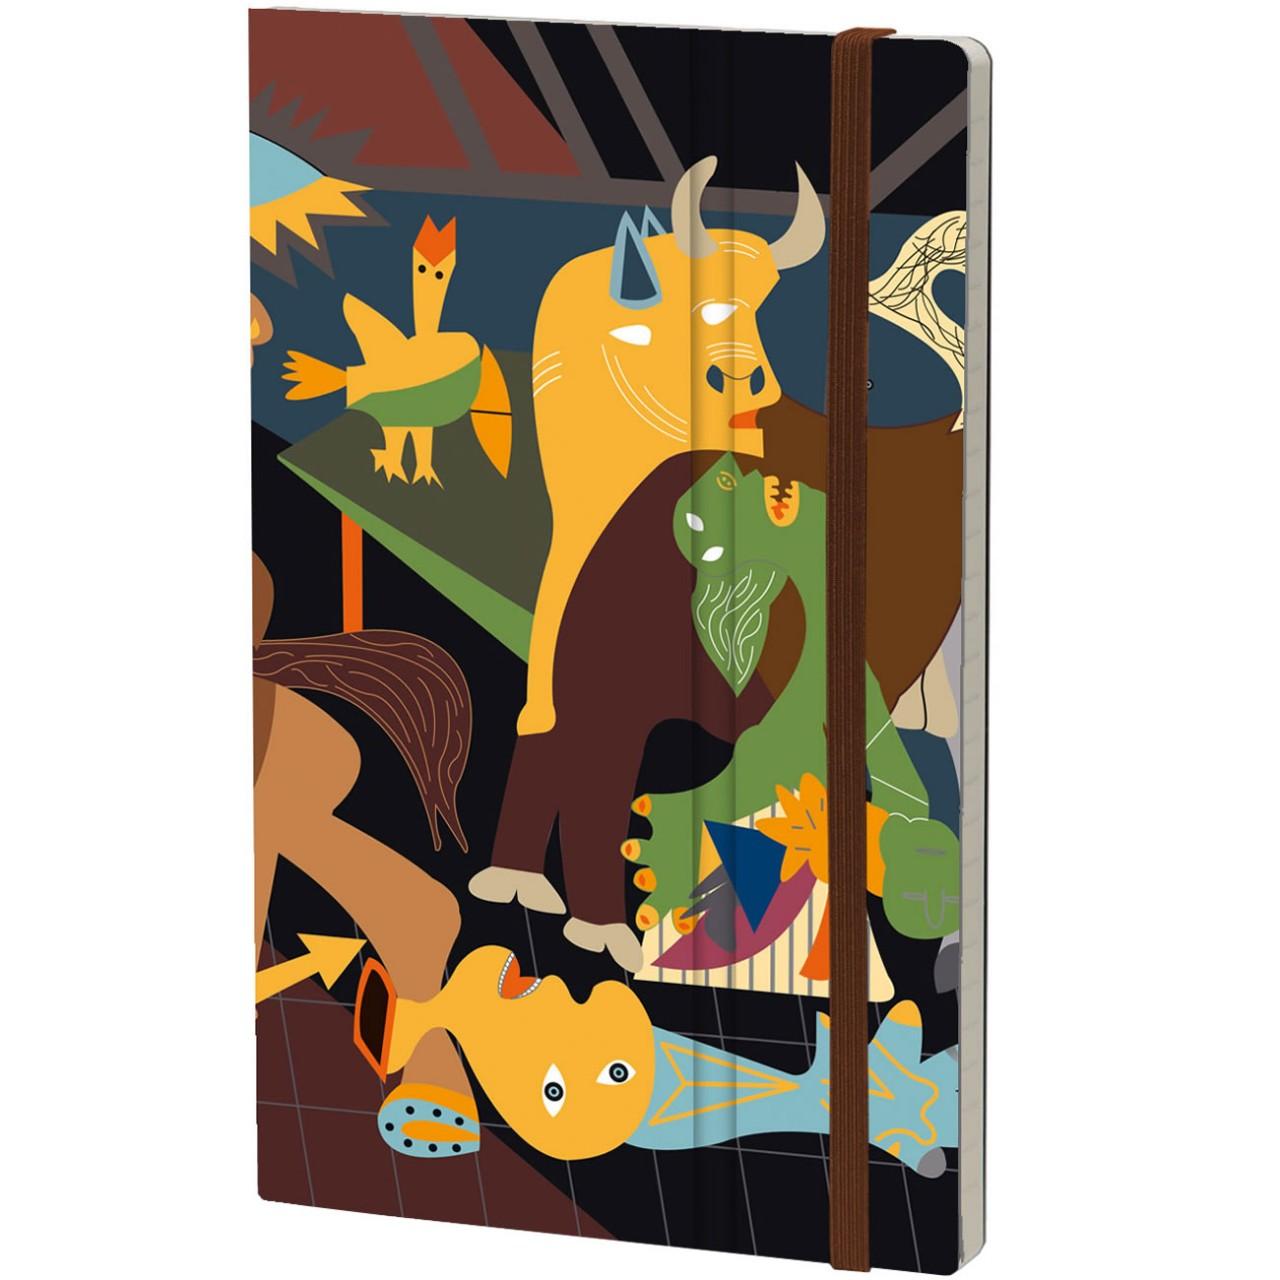 Stifflex Notizbuch ART 9 x 14 cm 144 S., PICASSO